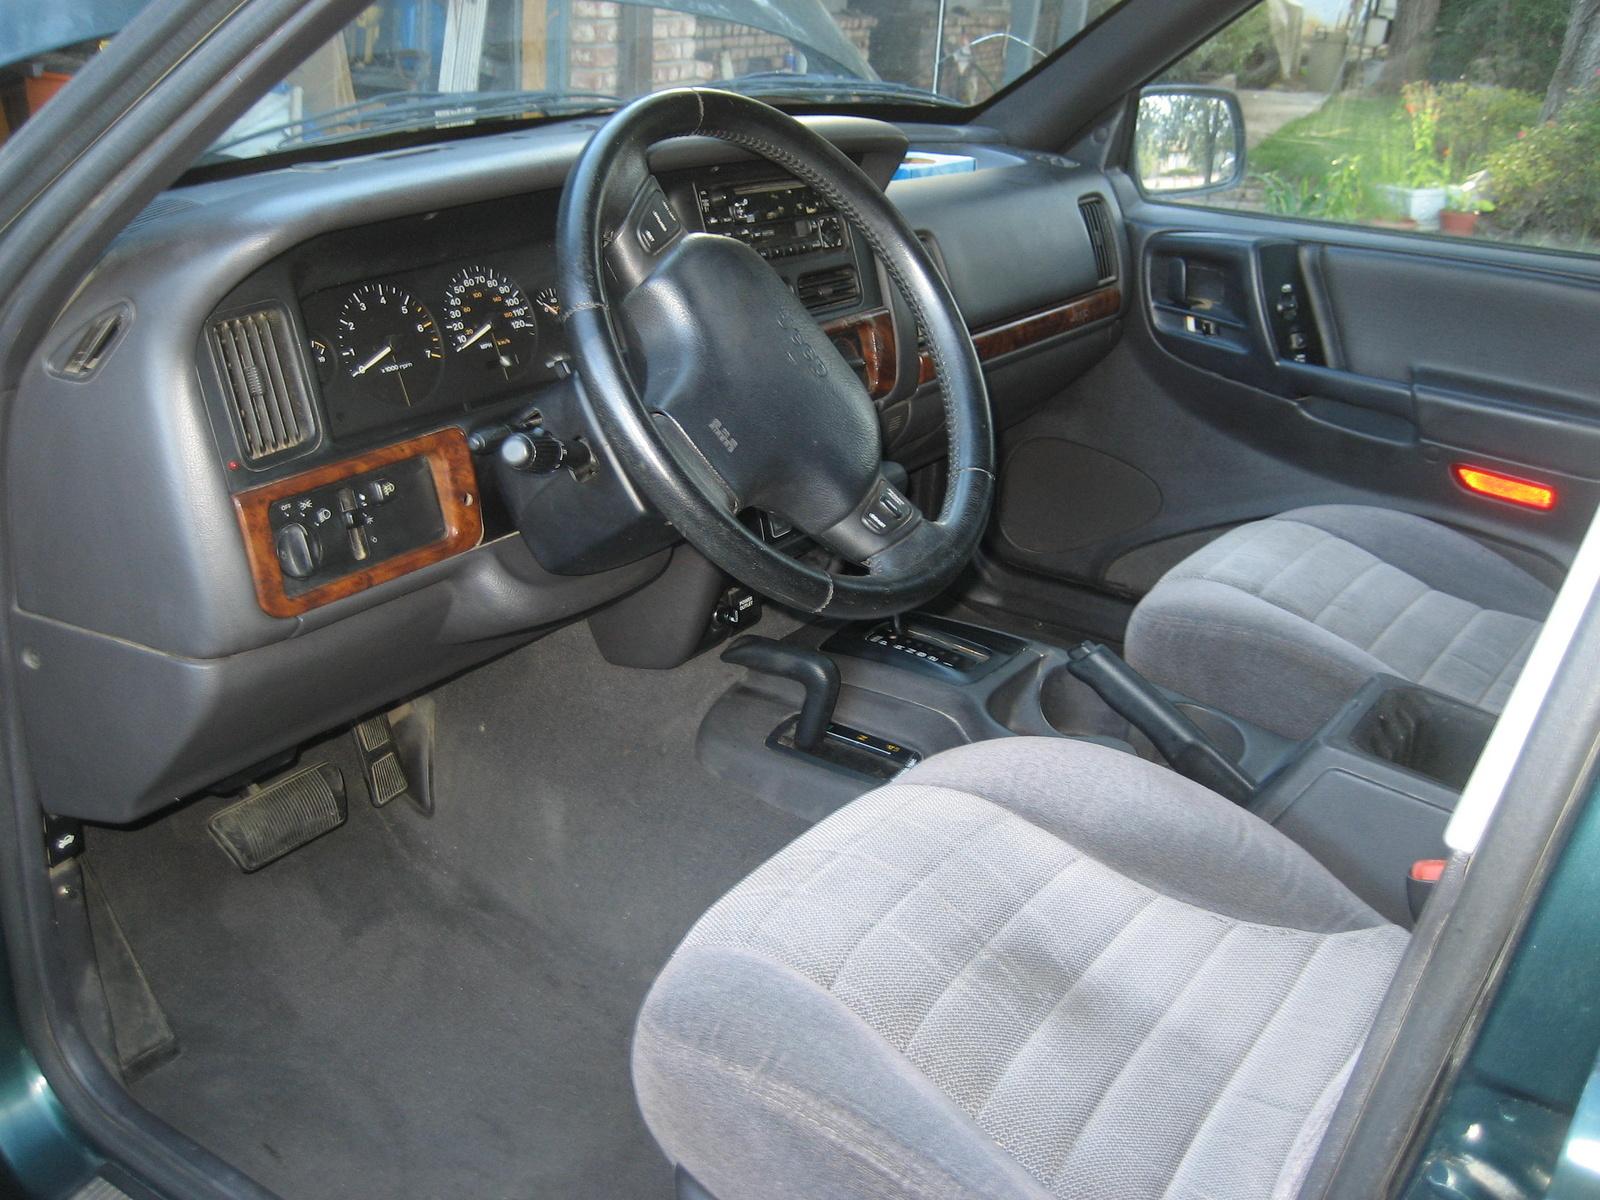 1997 jeep grand cherokee pictures cargurus - 1997 jeep grand cherokee interior ...